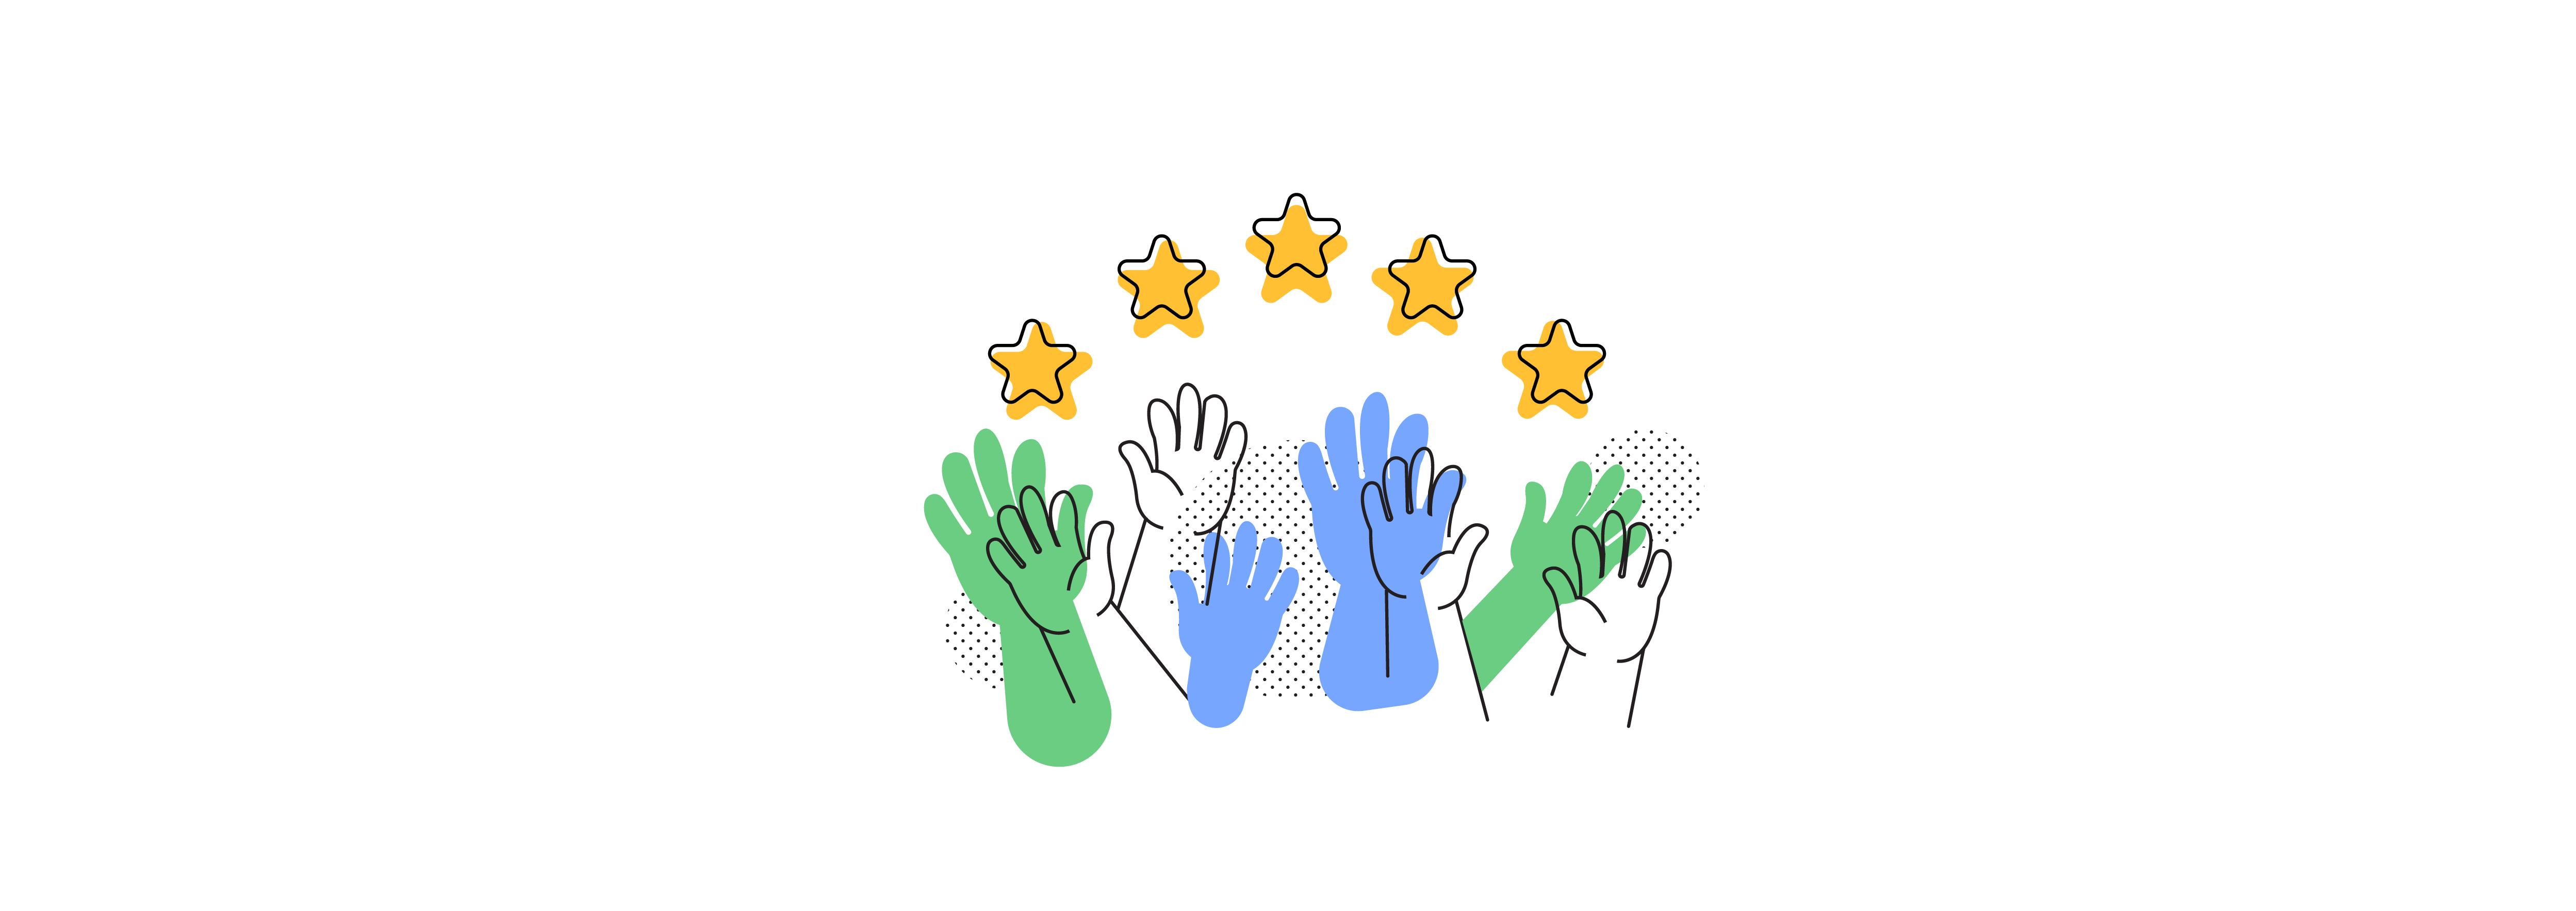 All hands reaching stars